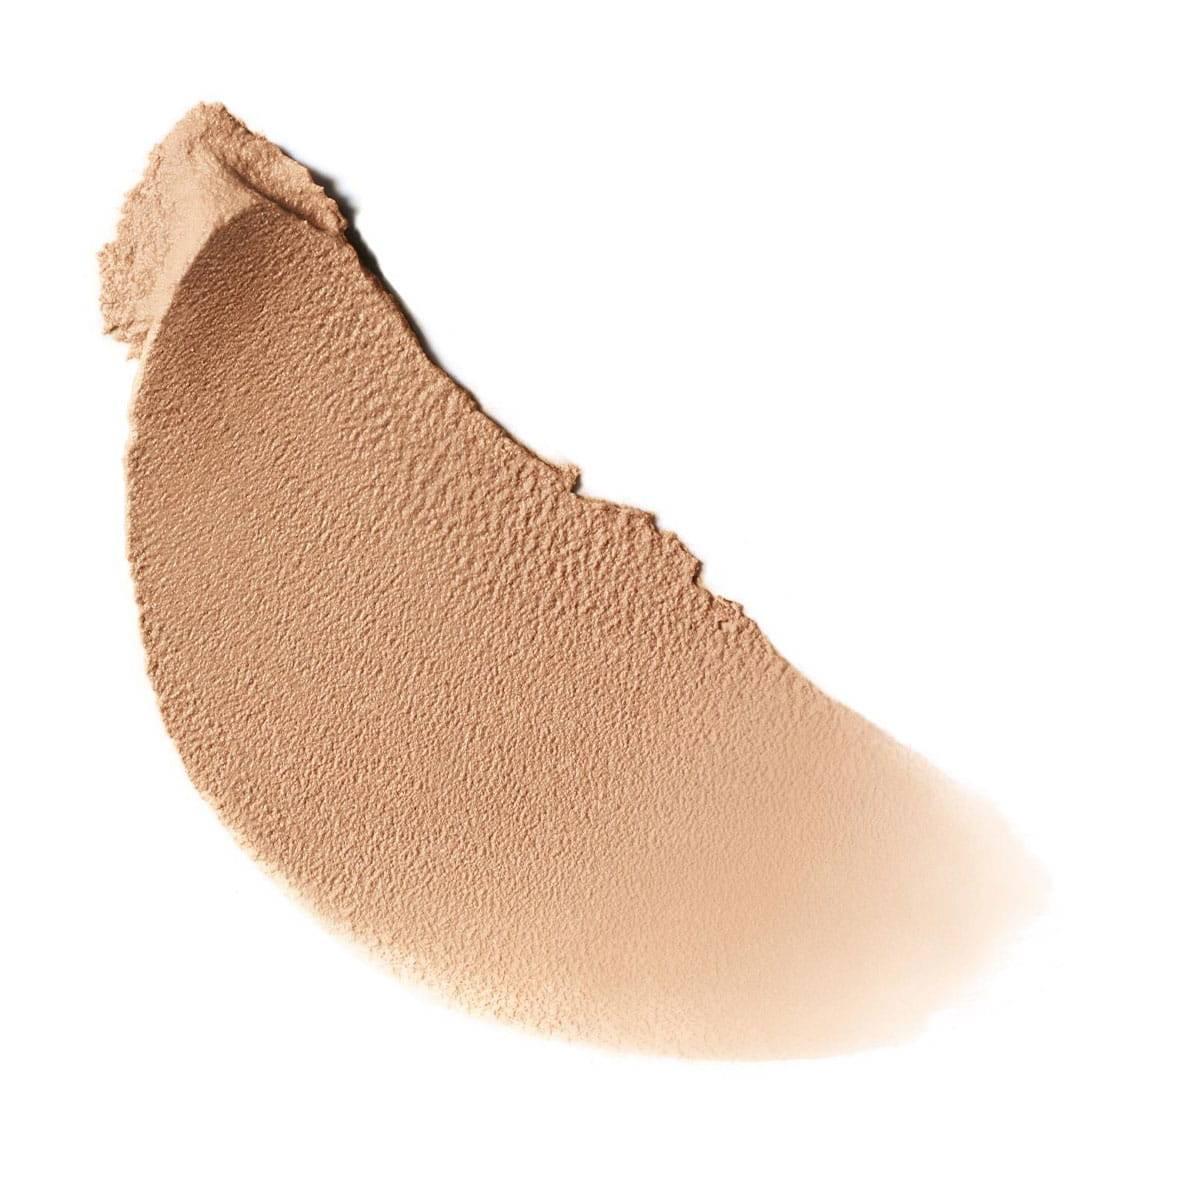 La Roche Posay Citlivá Toleriane Make-up MOUSSE_FOUNDATION_03SANDBEI